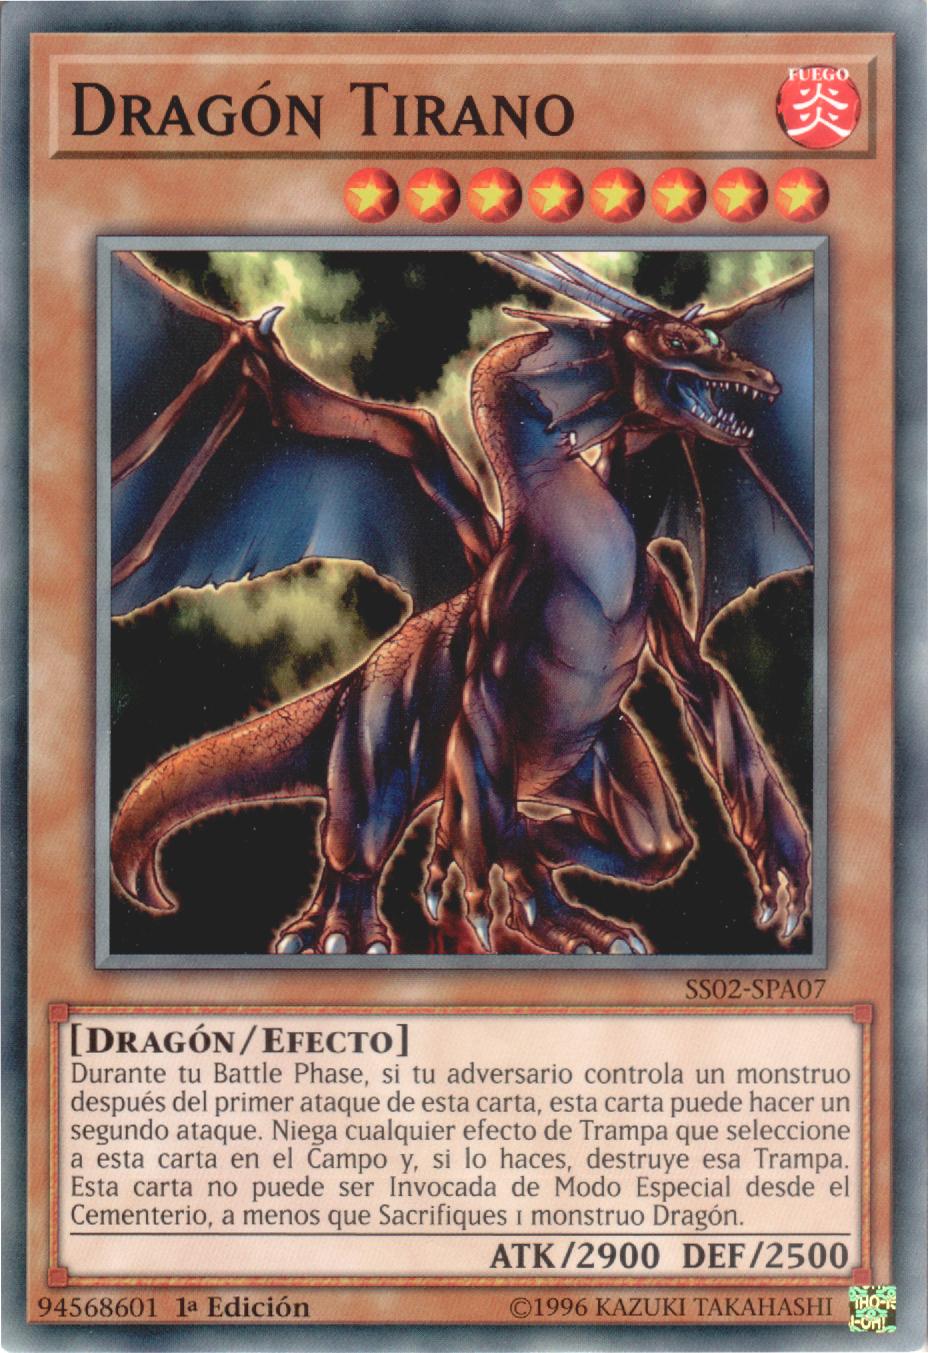 Dragón Tirano